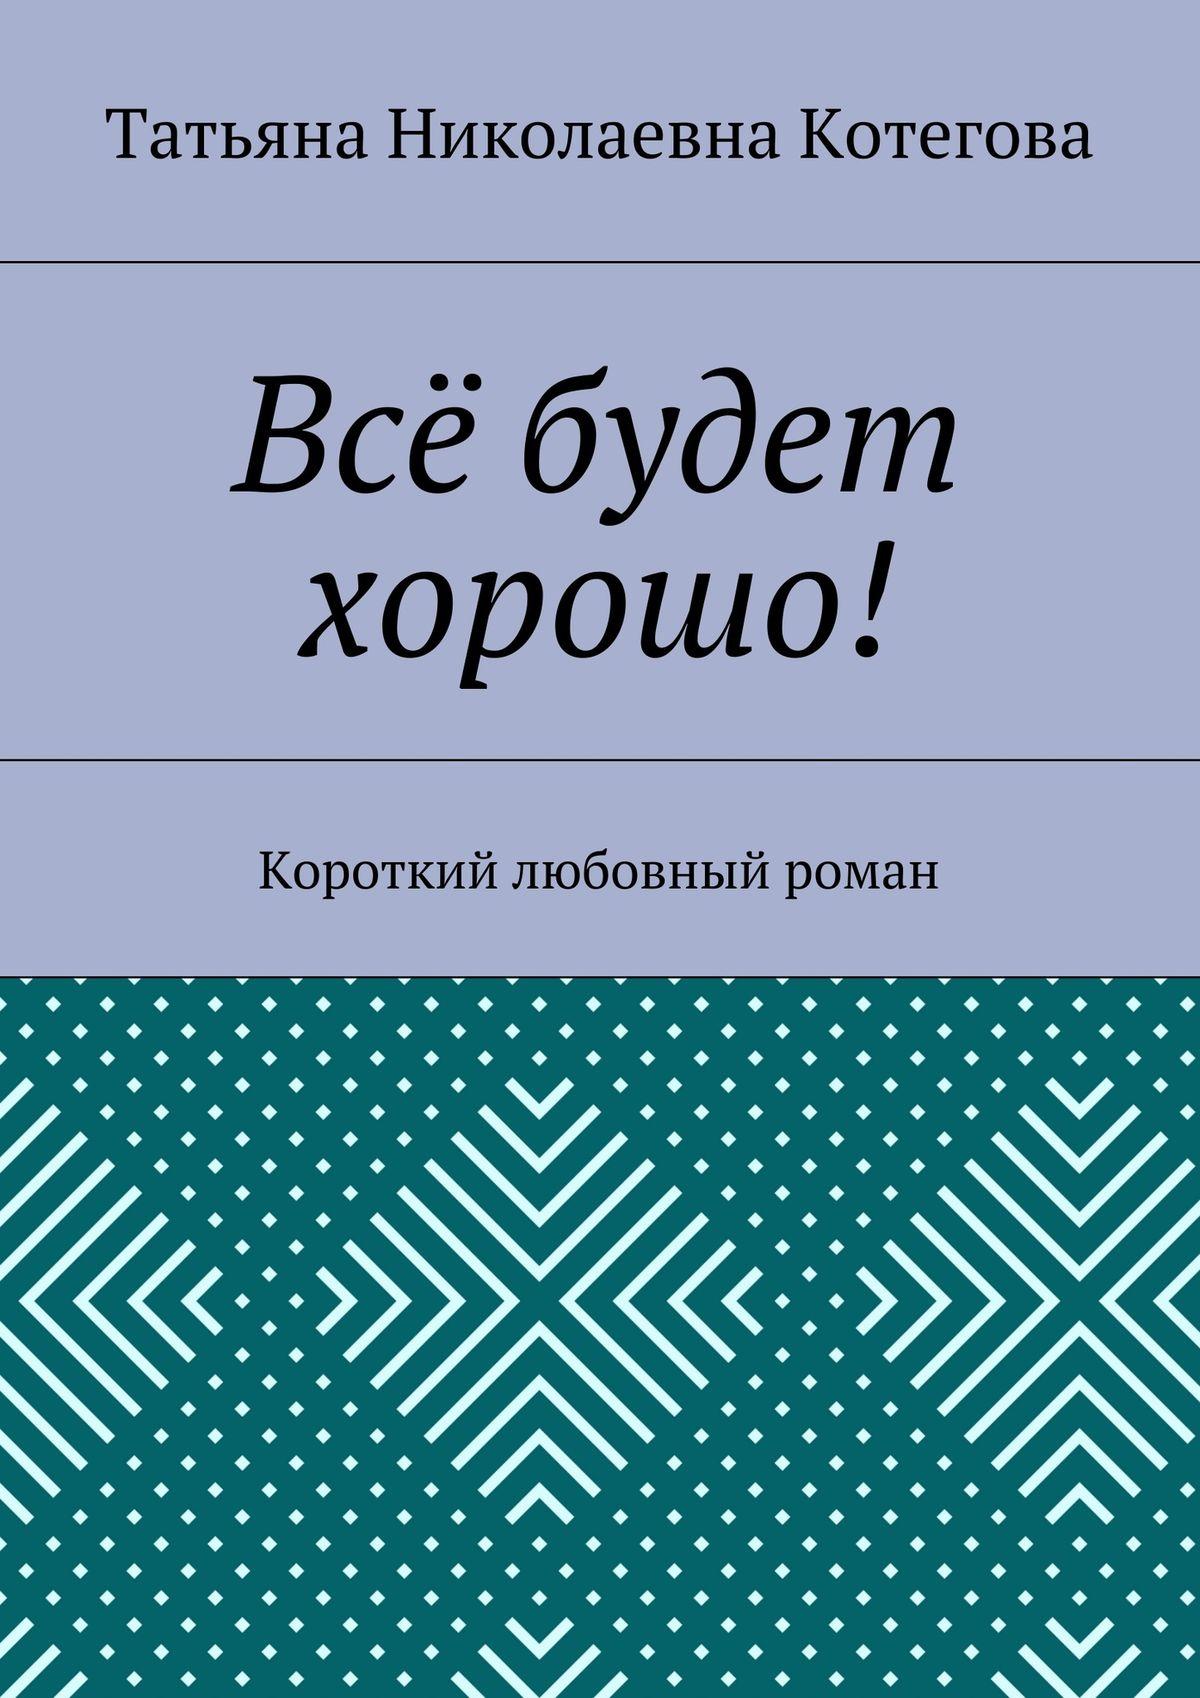 Татьяна Николаевна Котегова Всё будет хорошо! Короткий любовный роман